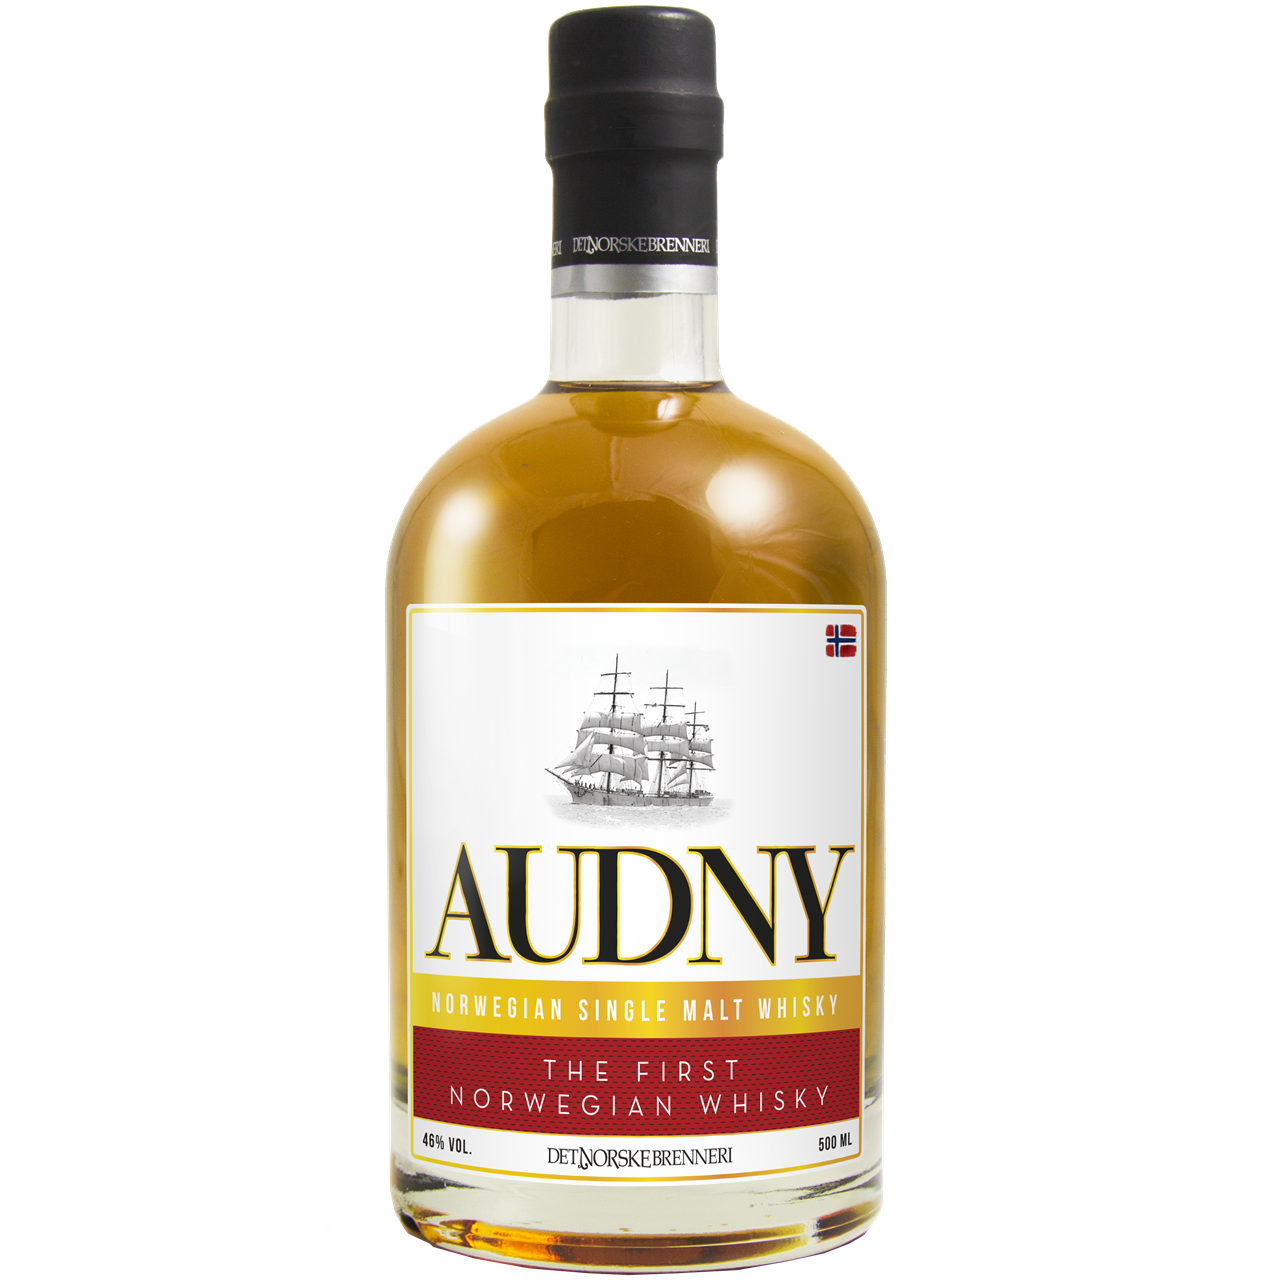 audny2015.png